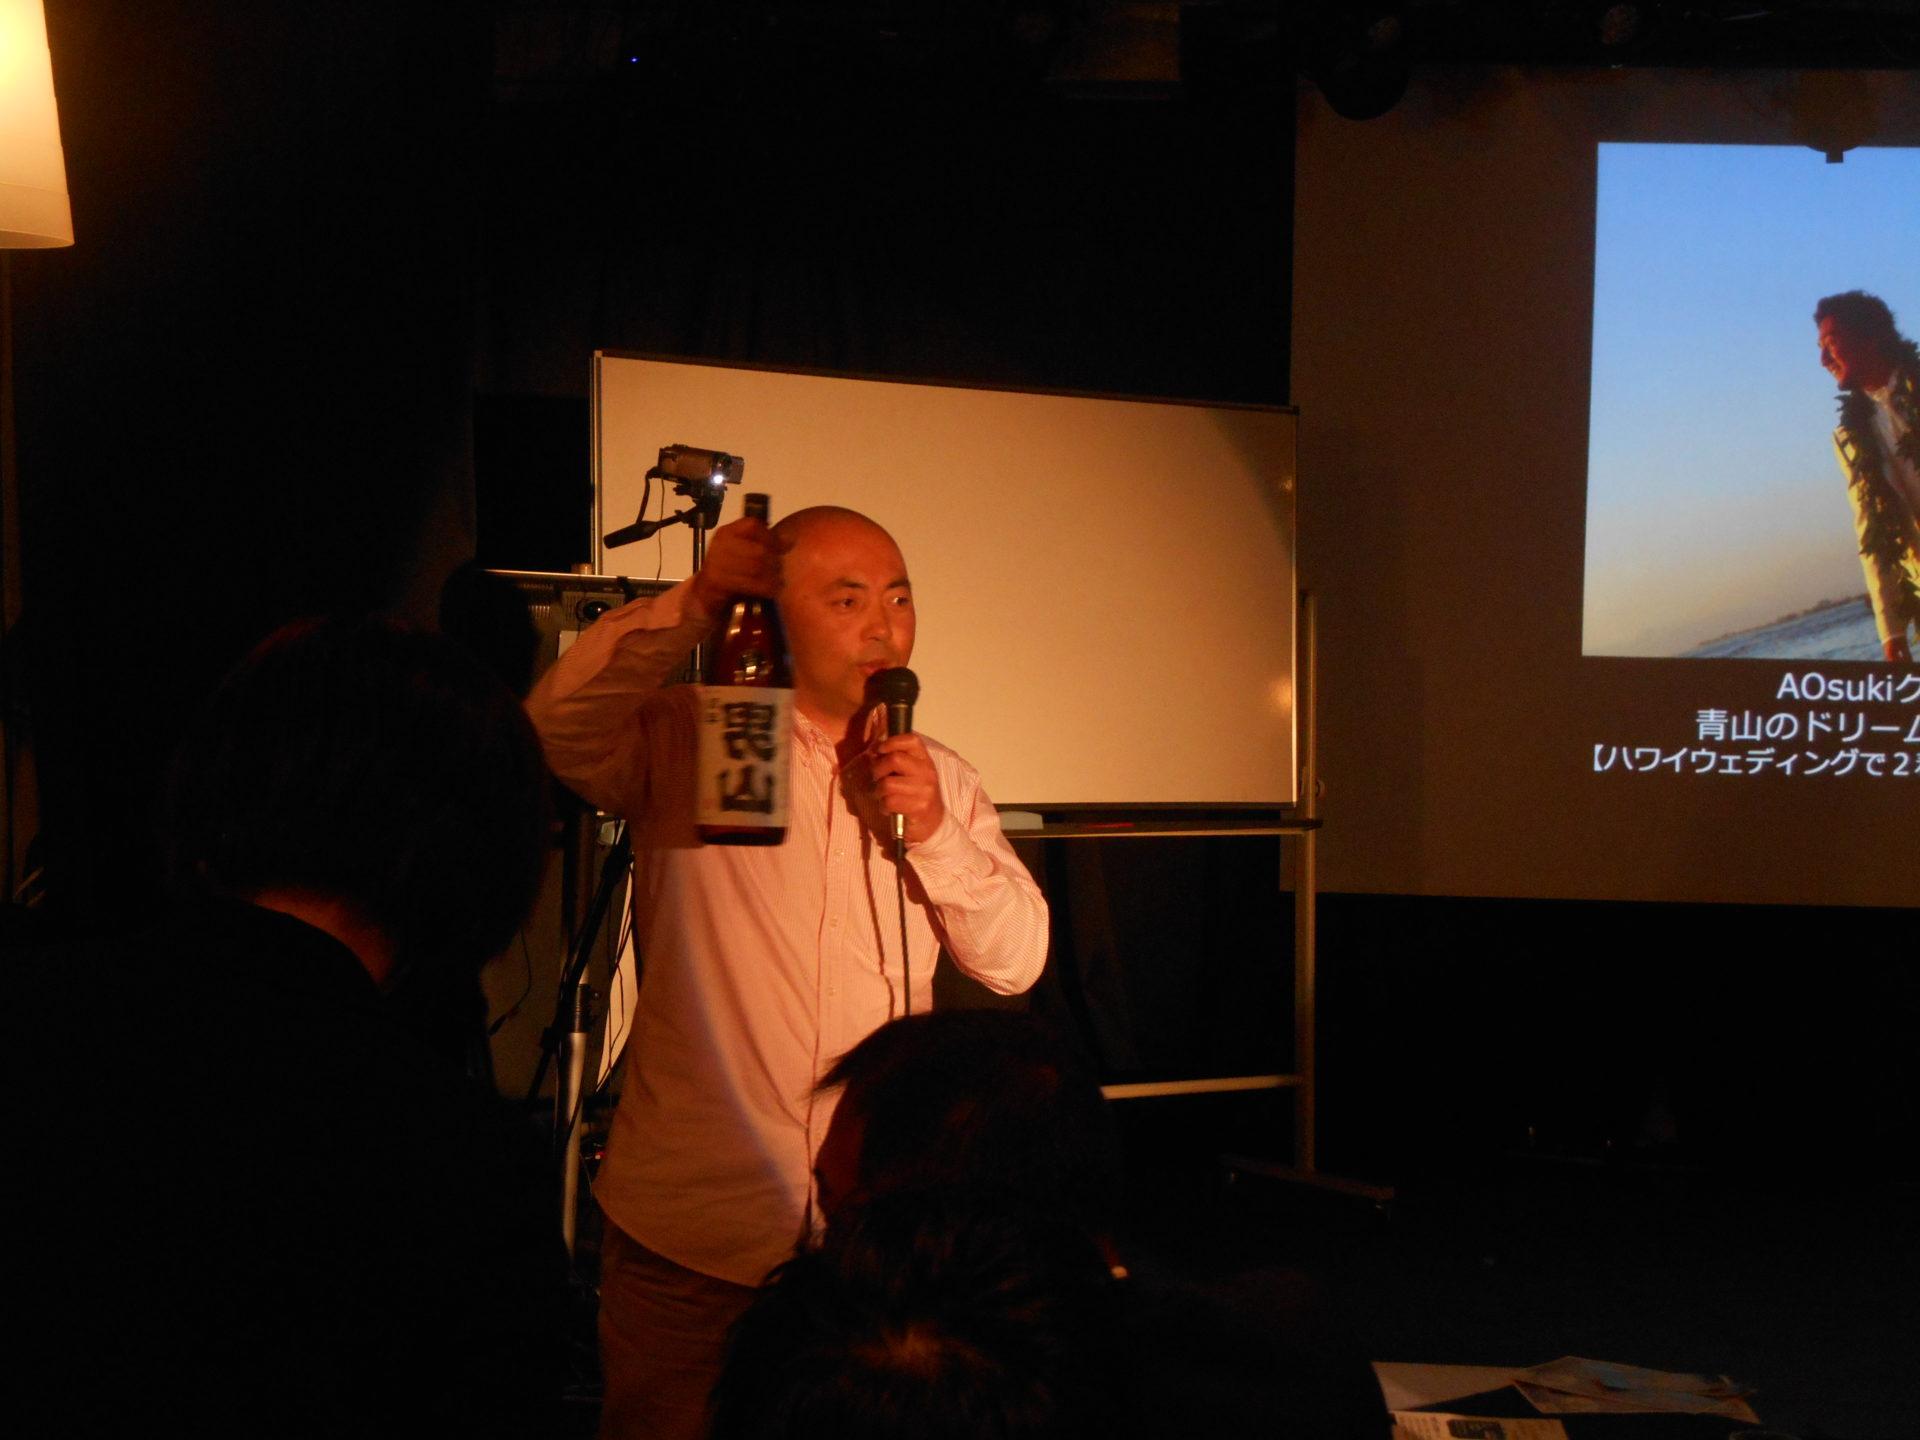 DSCN1063 1920x1440 - 2016年3月11日(金)AOsuki総会&パーティー開催しました。